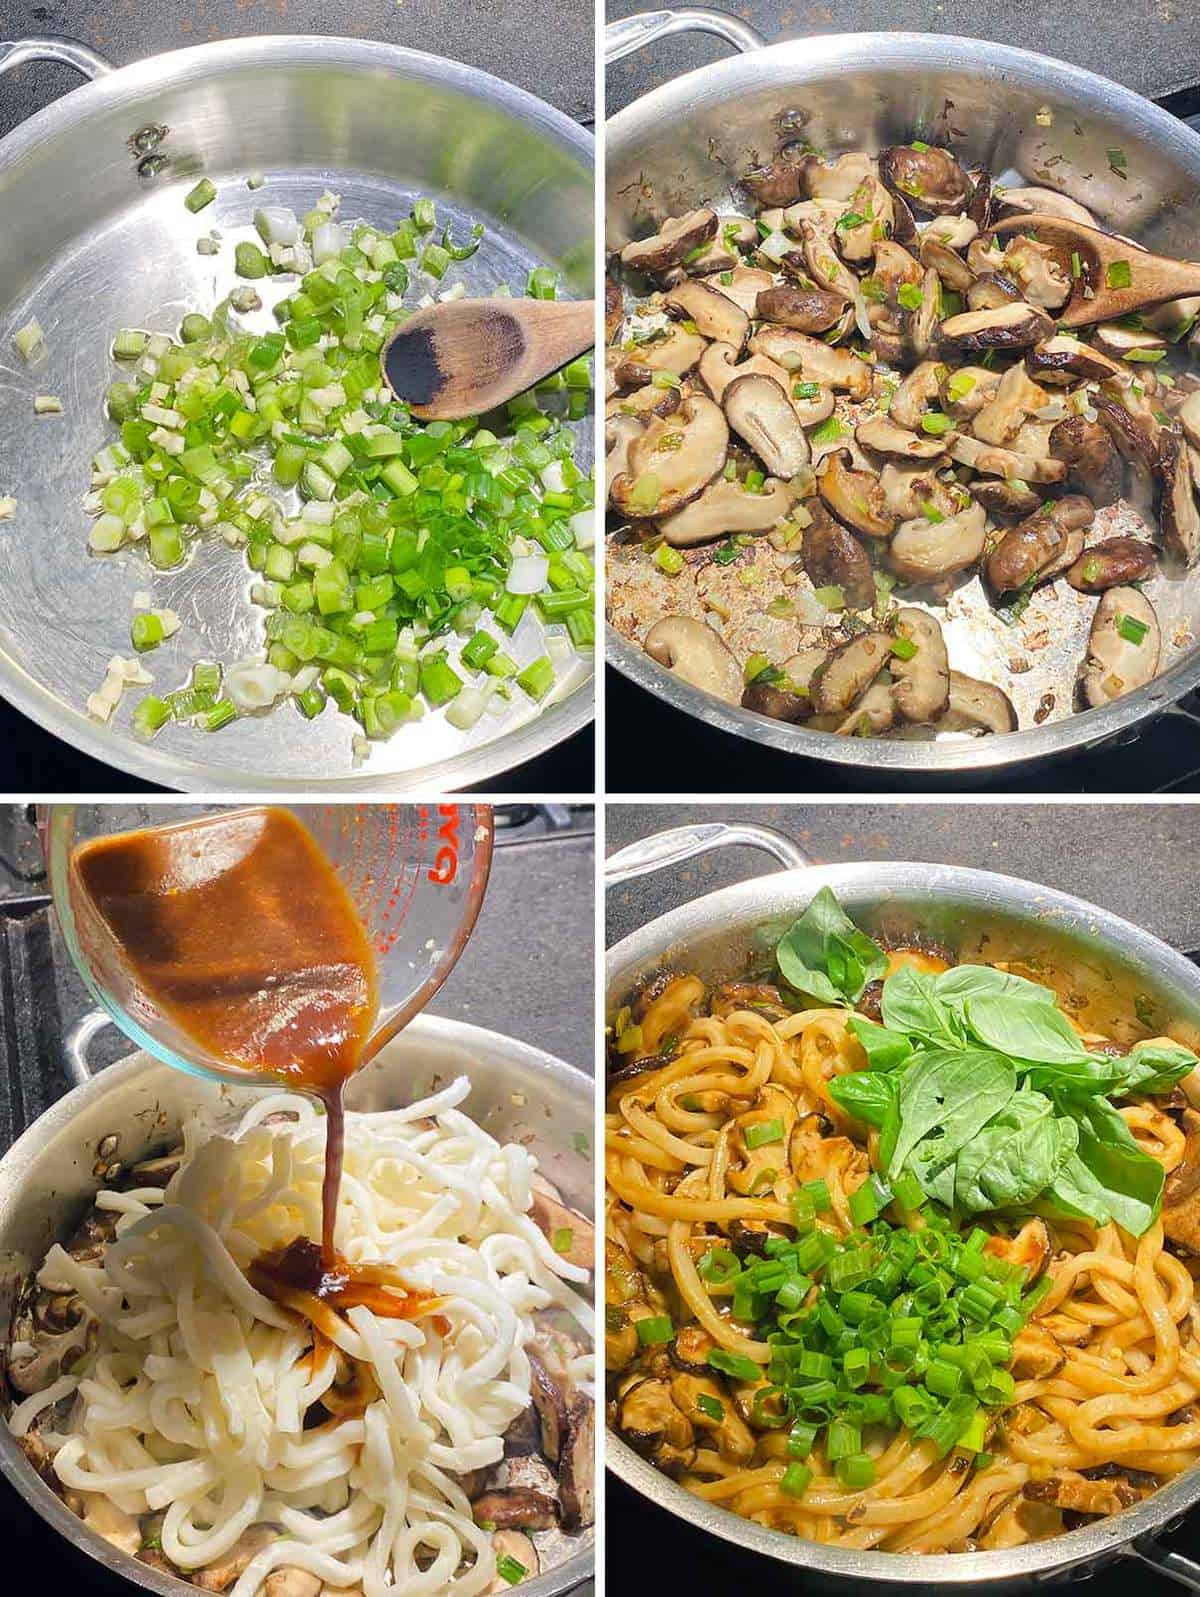 Process collage showing sautéing ingredients for udon noodle stir fry in a skillet.